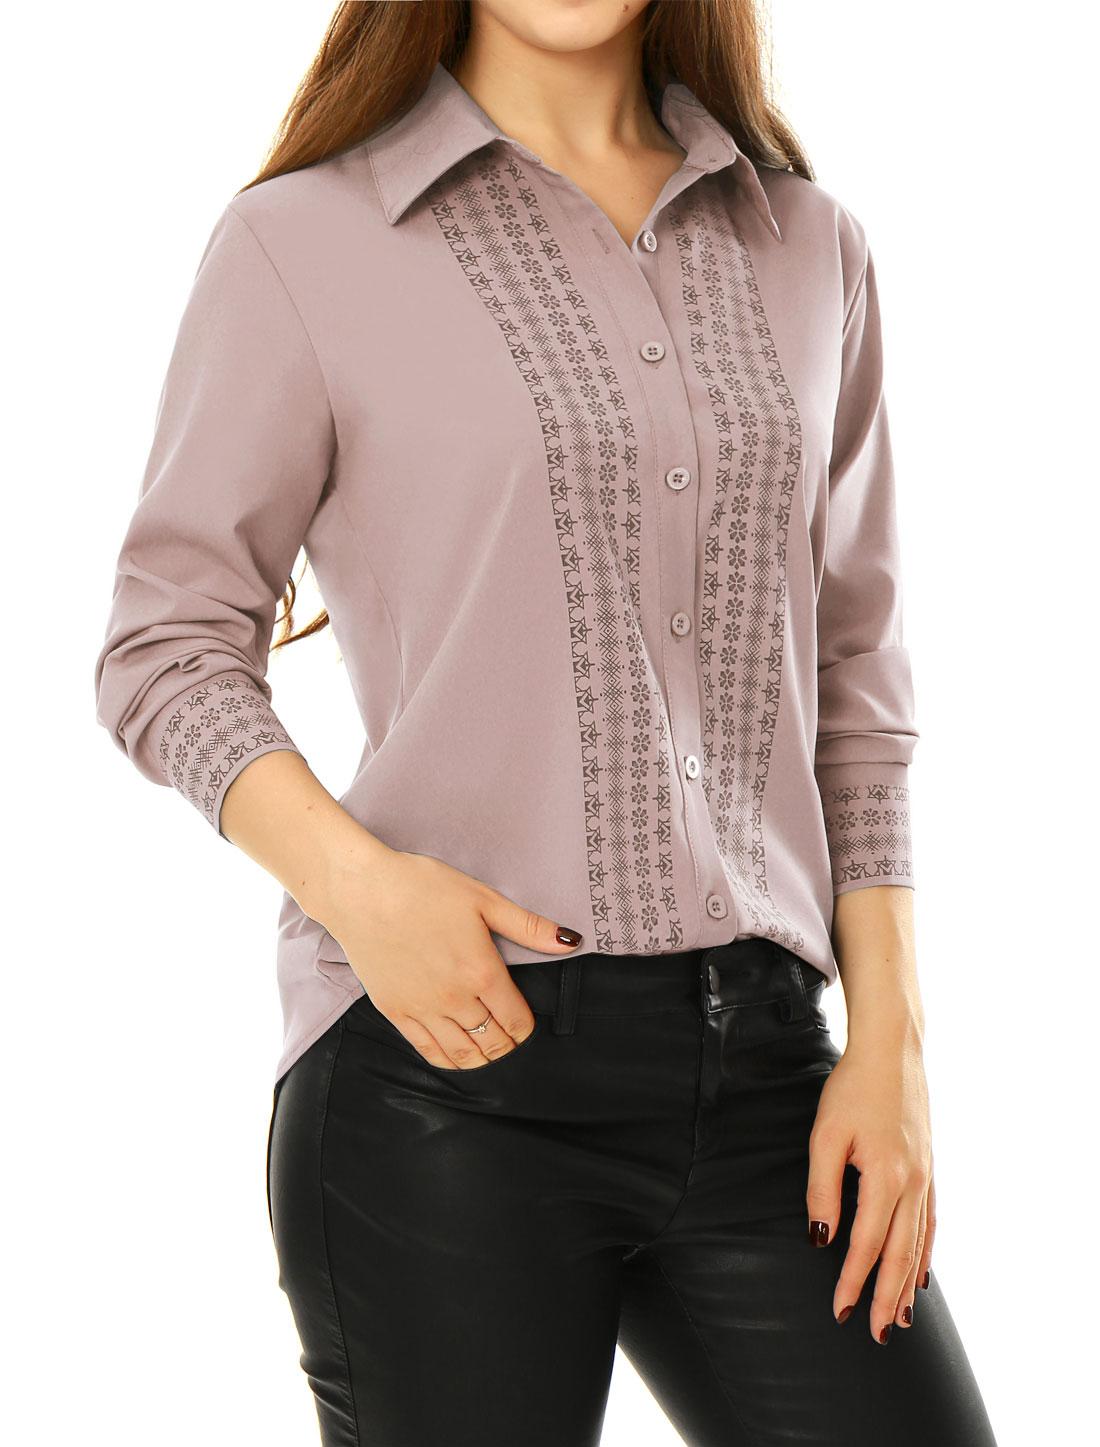 Women Tile Print Long Sleeves Buttoned Tunic Shirt Pink L